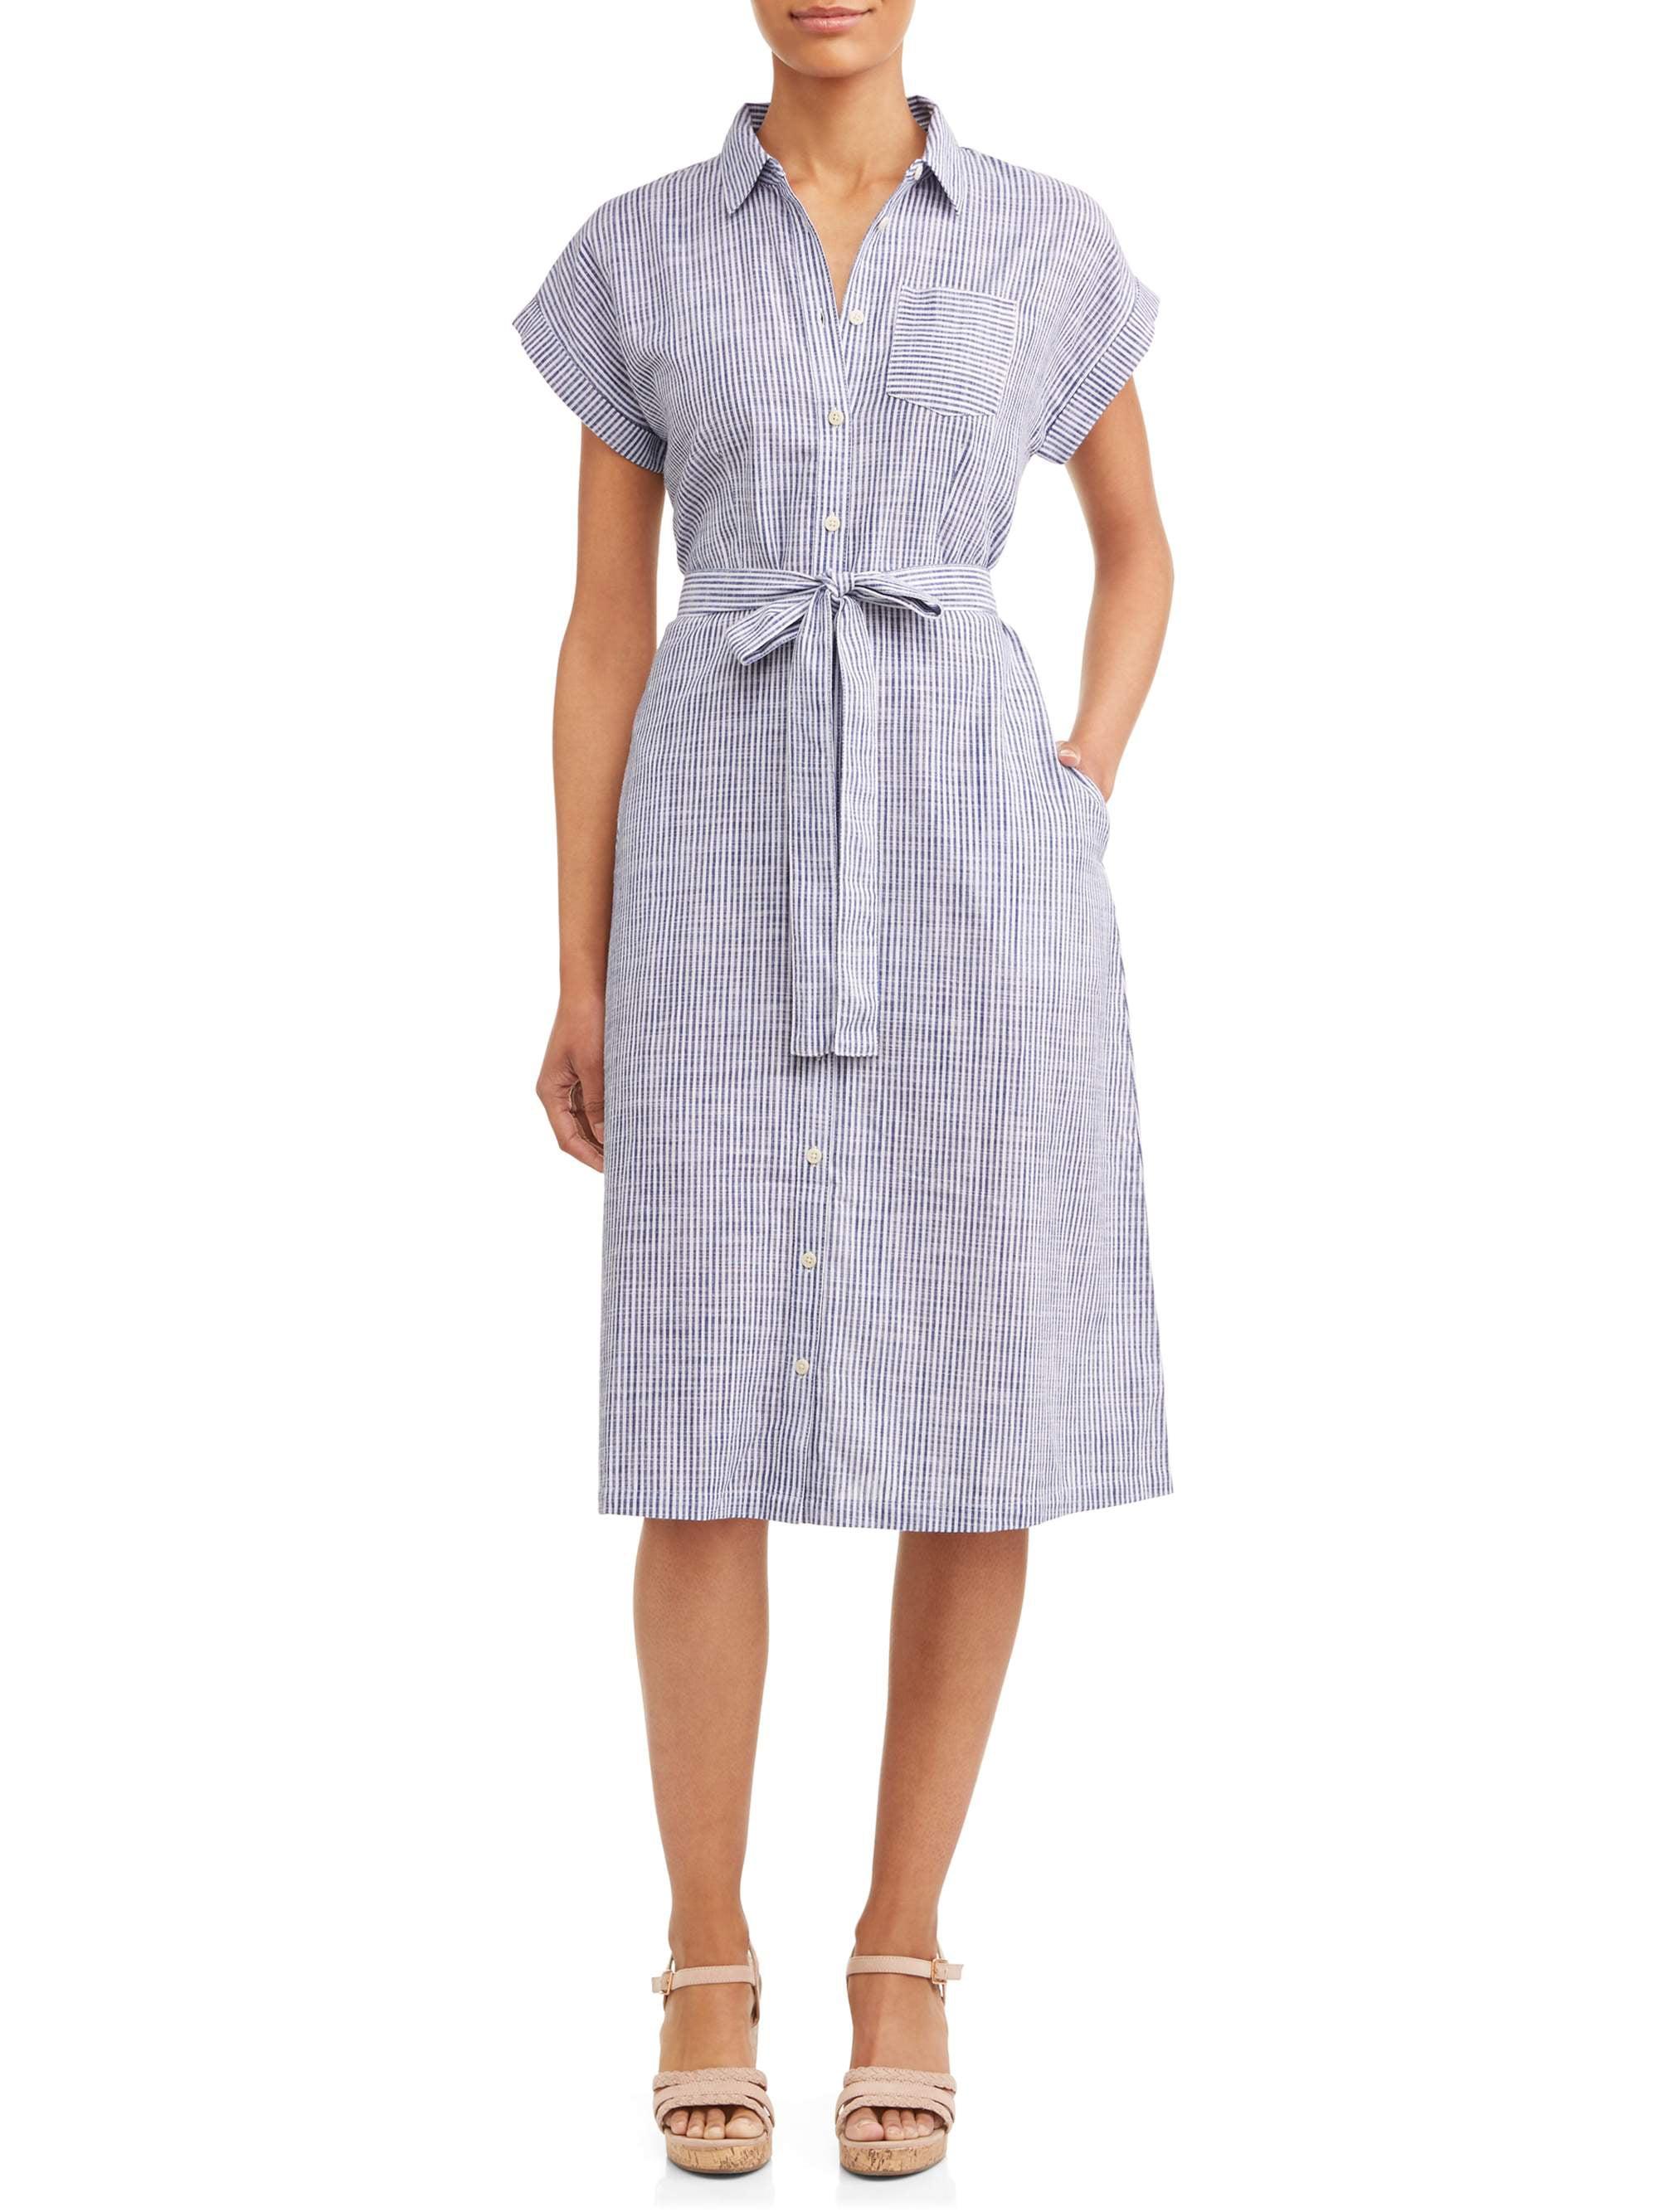 7c6aff1b4a5b3 Women's Belted Midi Shirt Dress with Pocket - Walmart.com